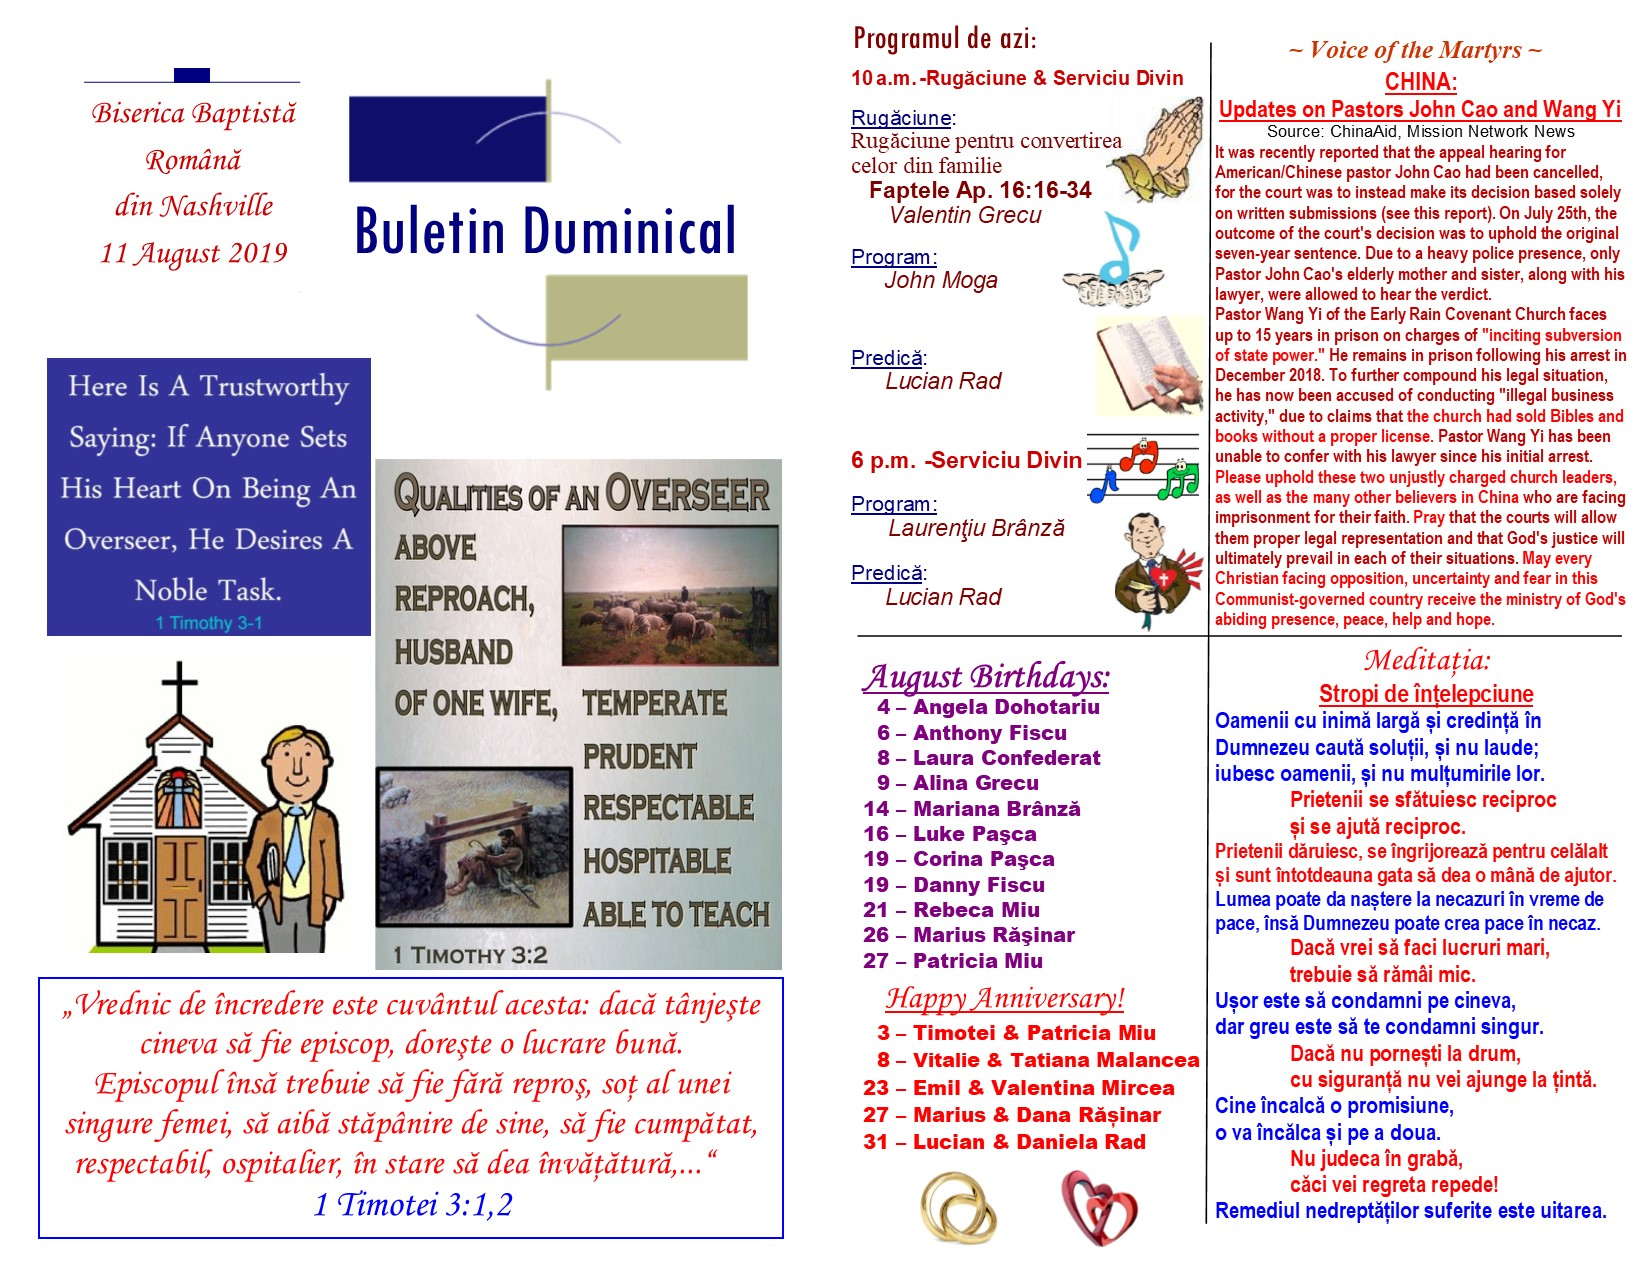 Buletin 08-11-19 page 1 & 2